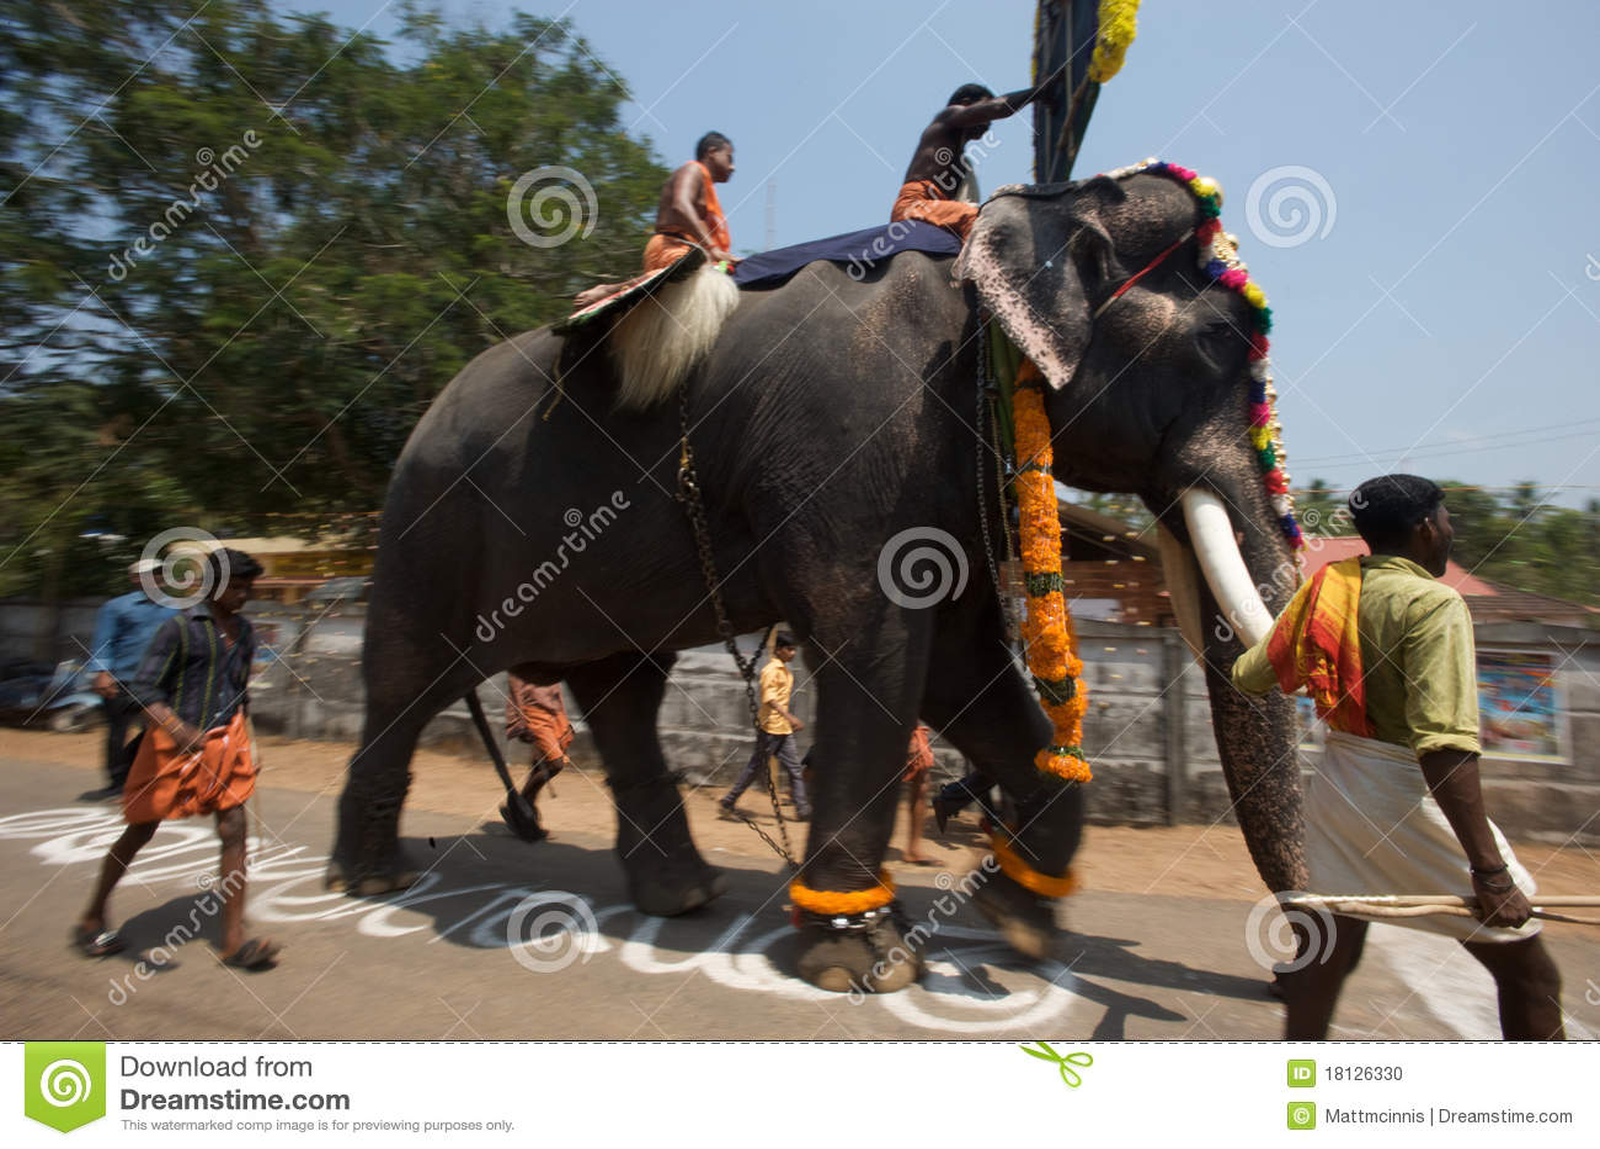 Kerala Elephant Festival Stock Images 190 Photos